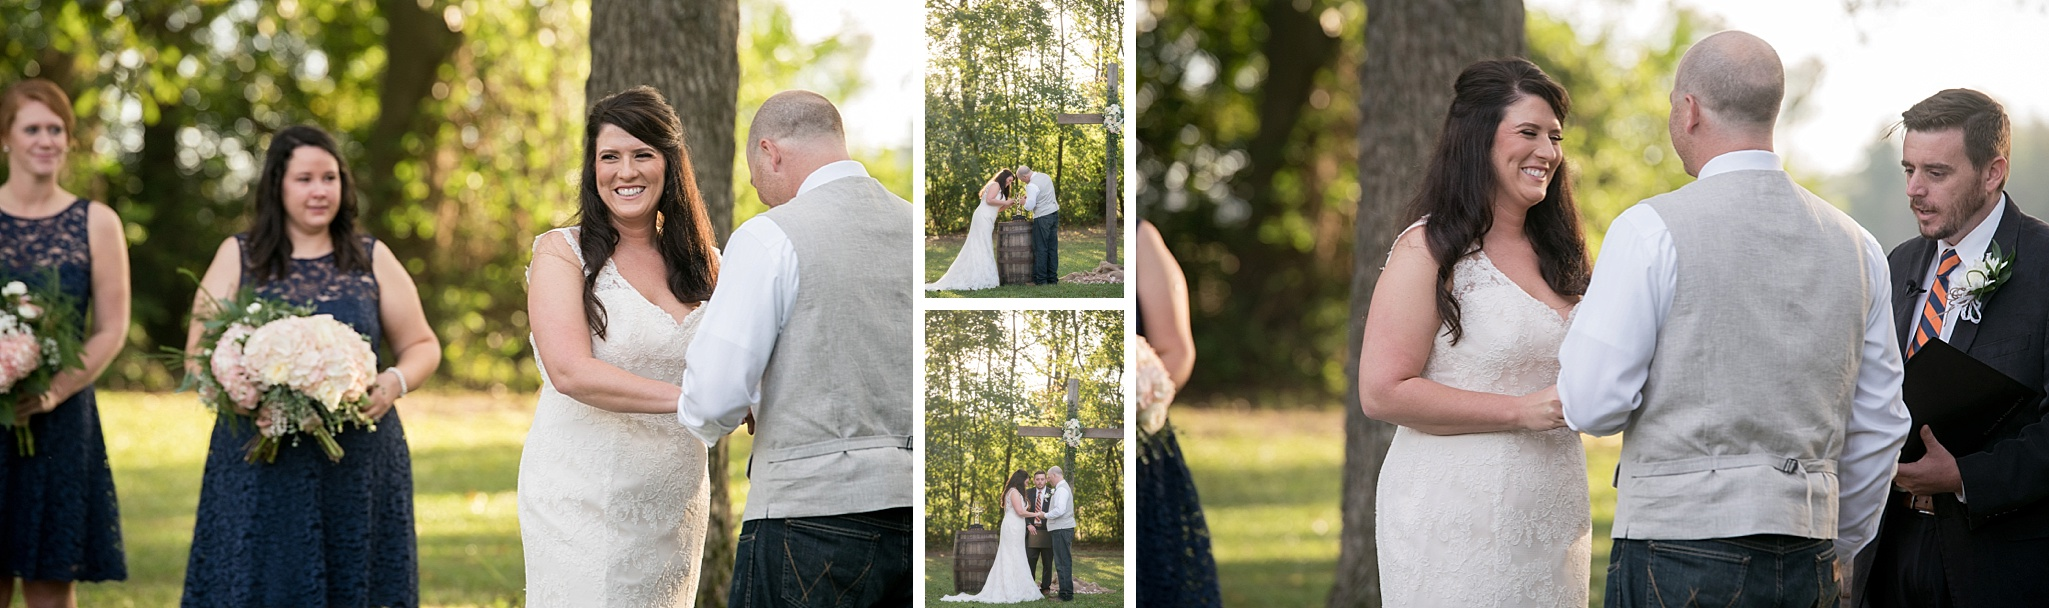 Tarboro-NC-Wedding-Photographer-052.jpg